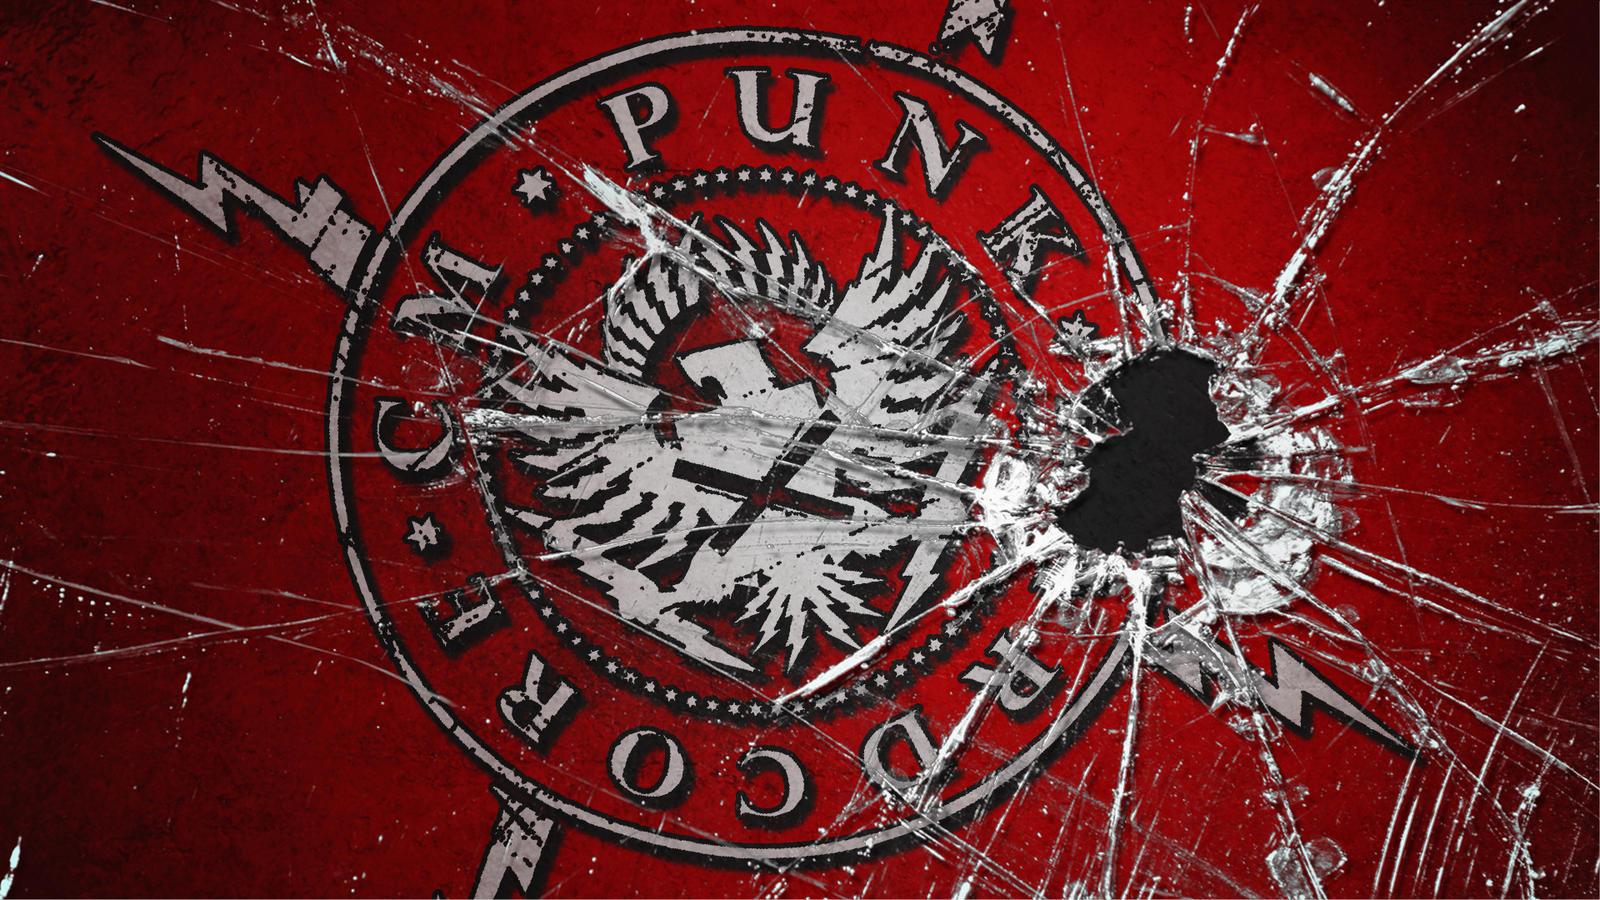 cm punk logo page 8